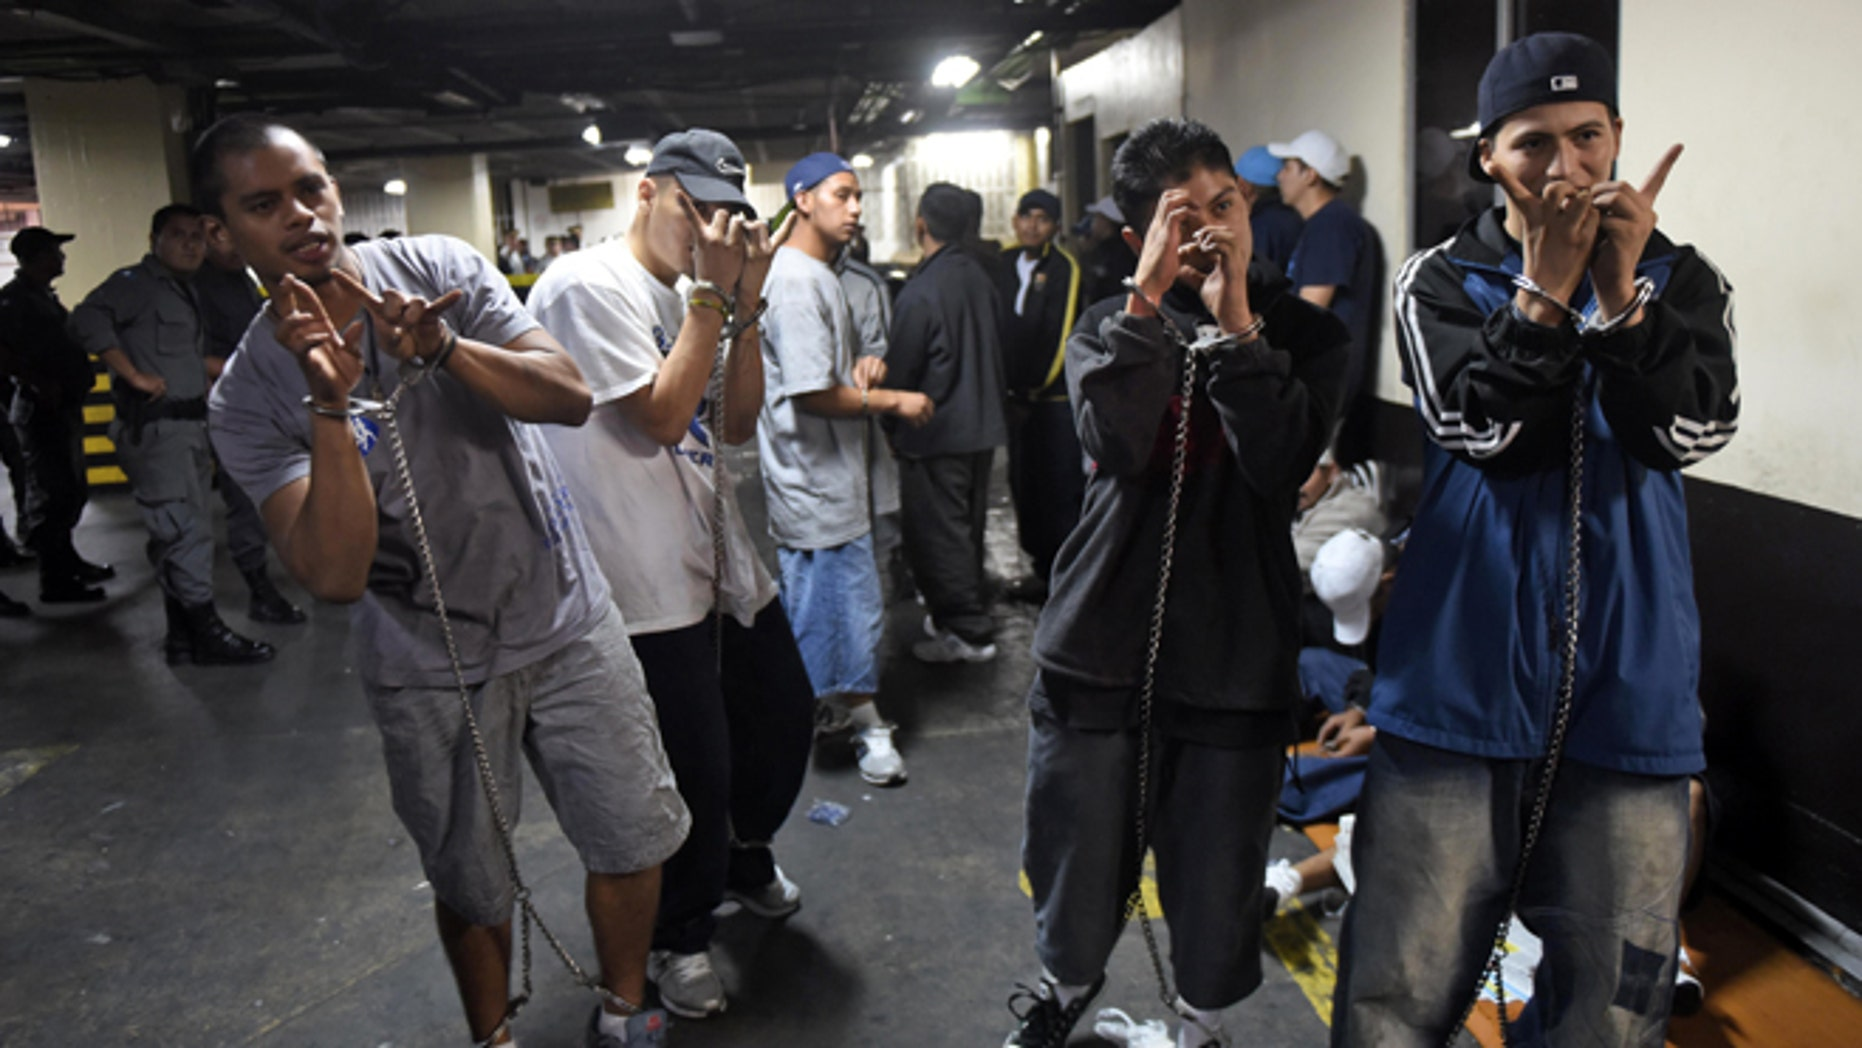 MS-13 gang recruiting 'border surge' kids, fueling violence